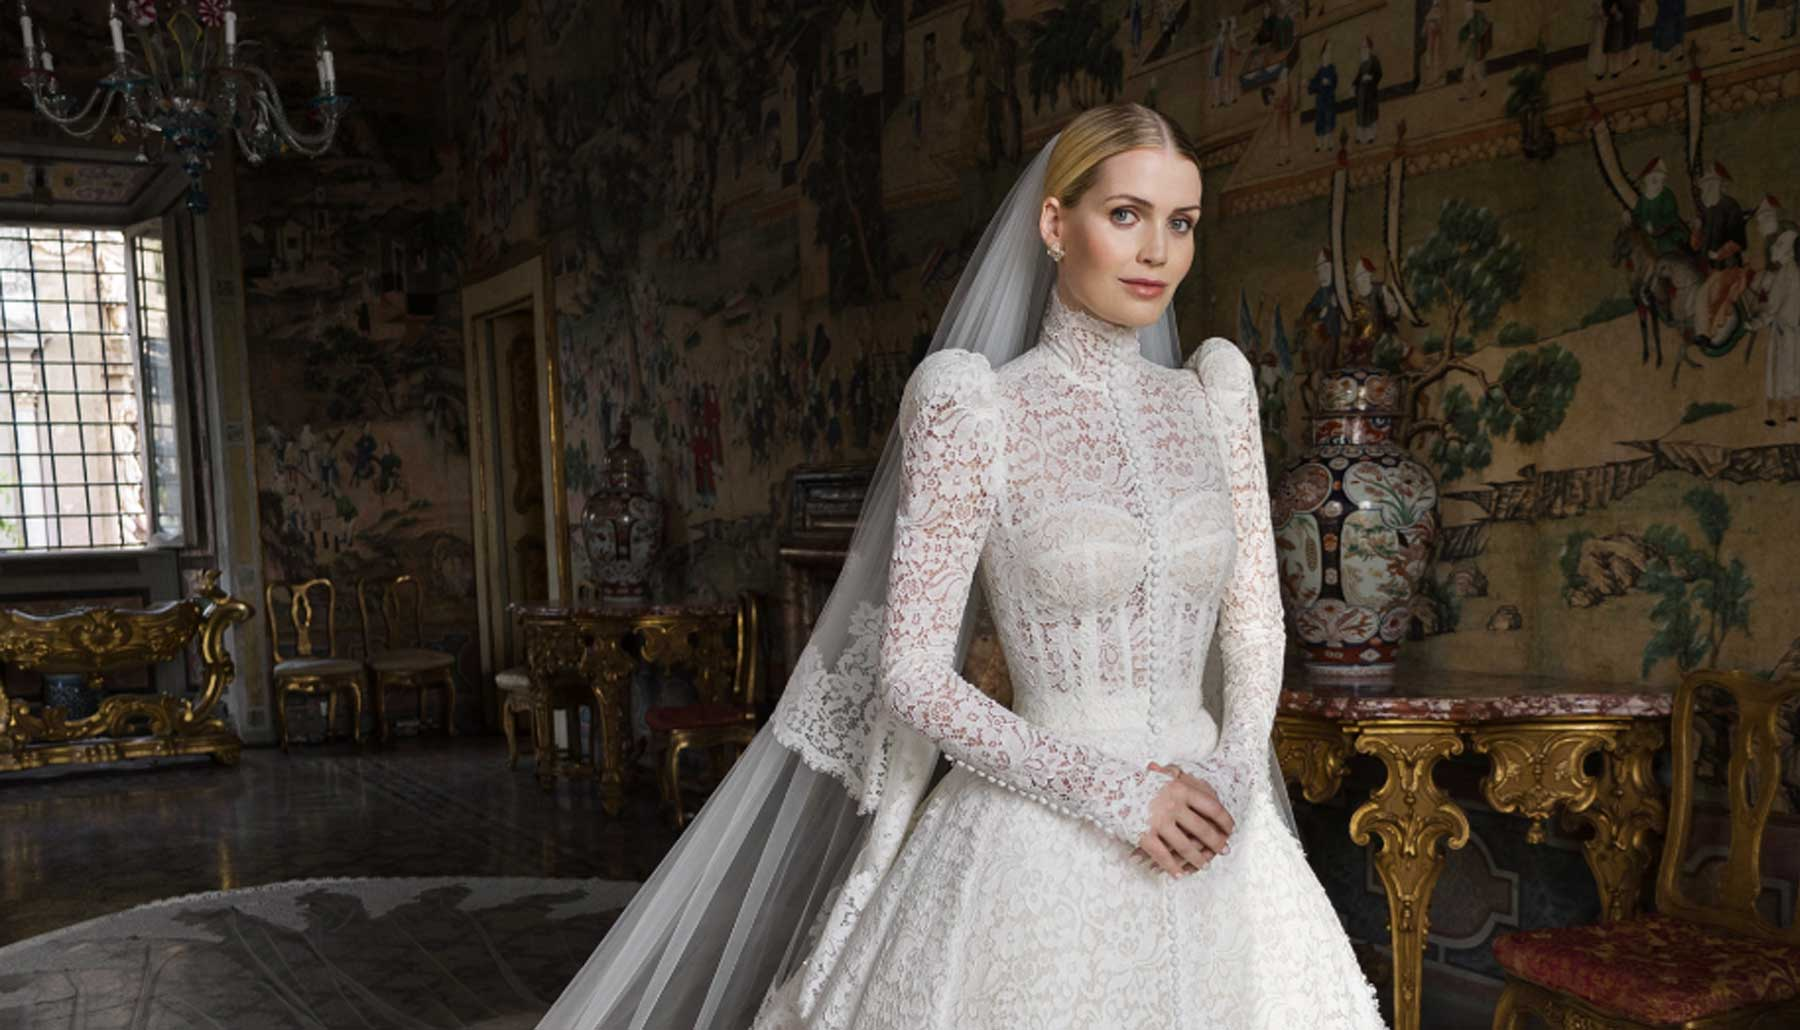 Lady Kitty Spencer vestido de novia blanco